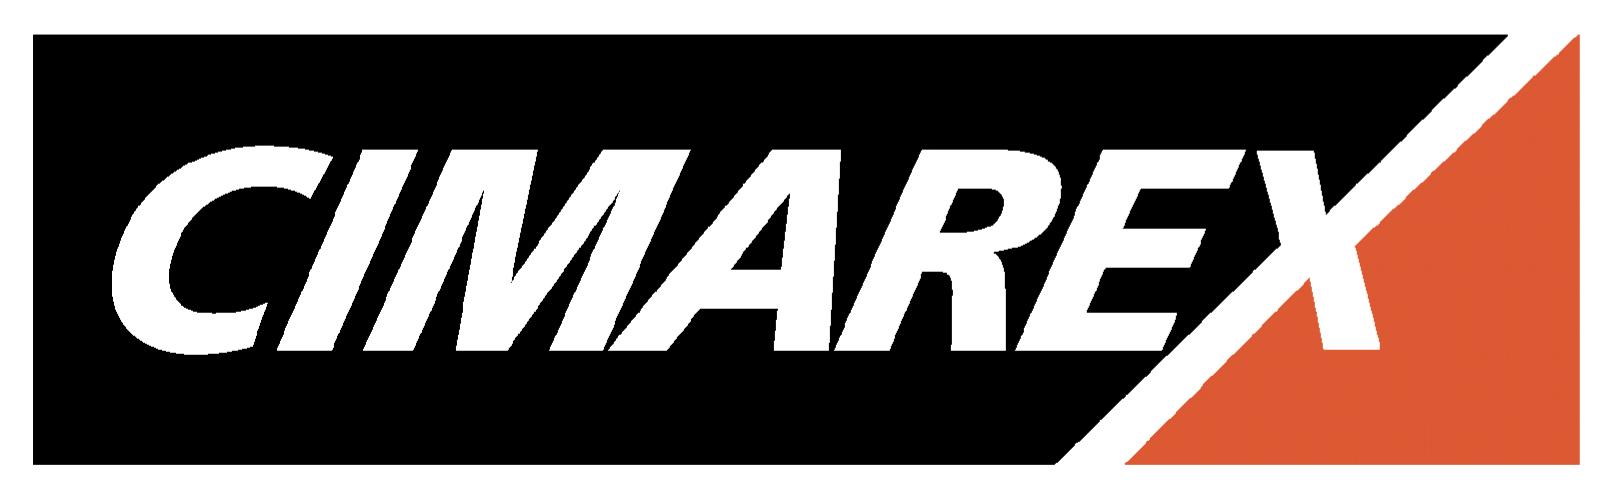 Cimarex-Energy-logo_edited